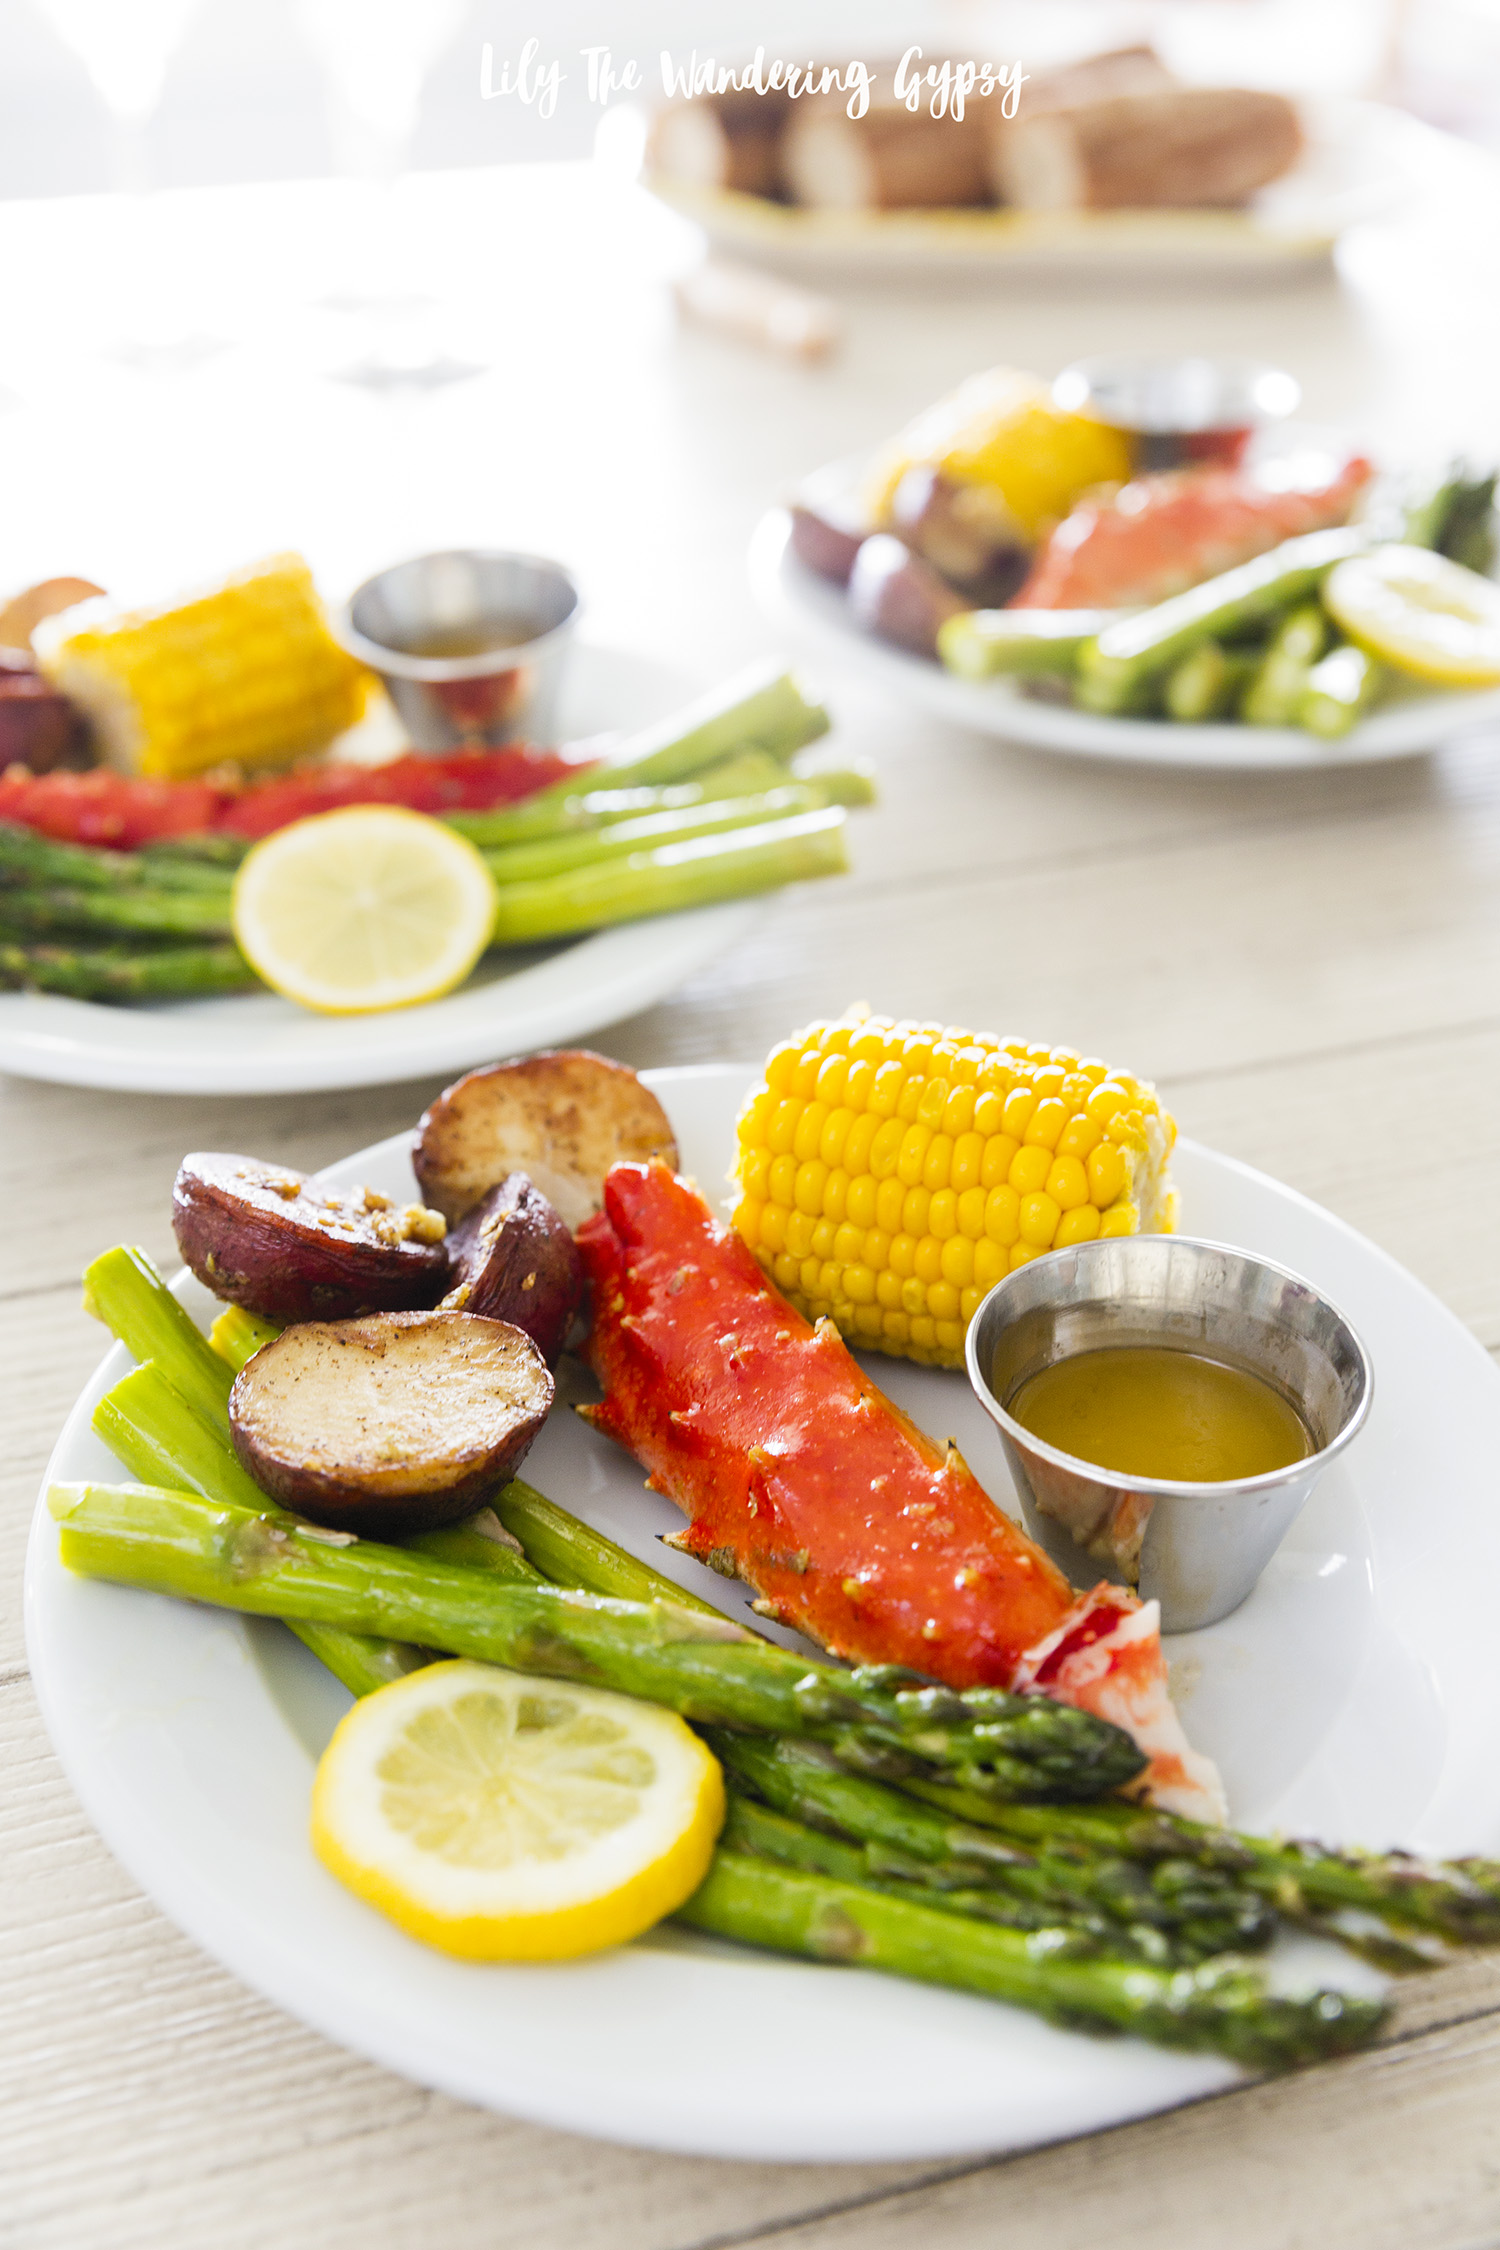 Alaska King Crab Legs Recipe + Sides